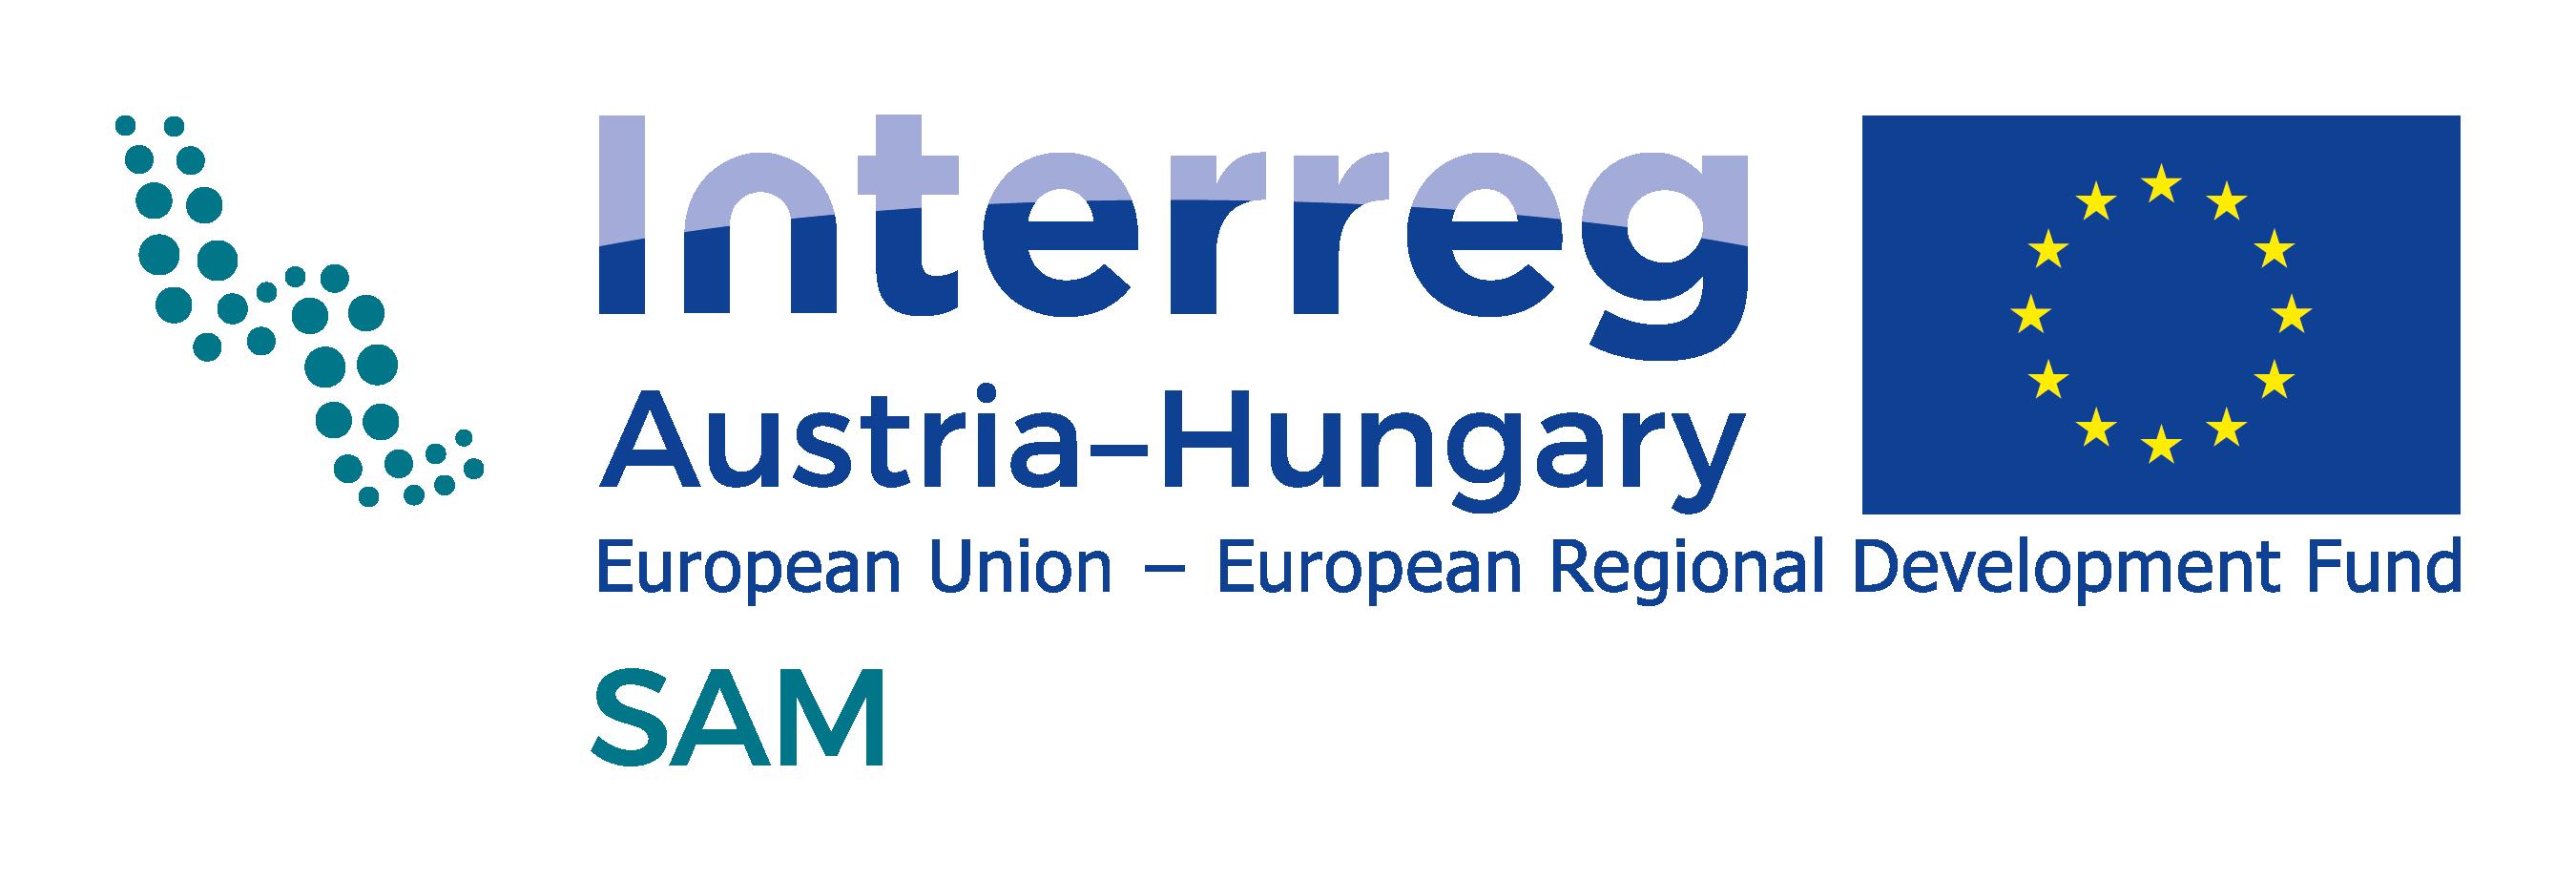 Projectlogo Interreg AT-HU_SAM_rgb